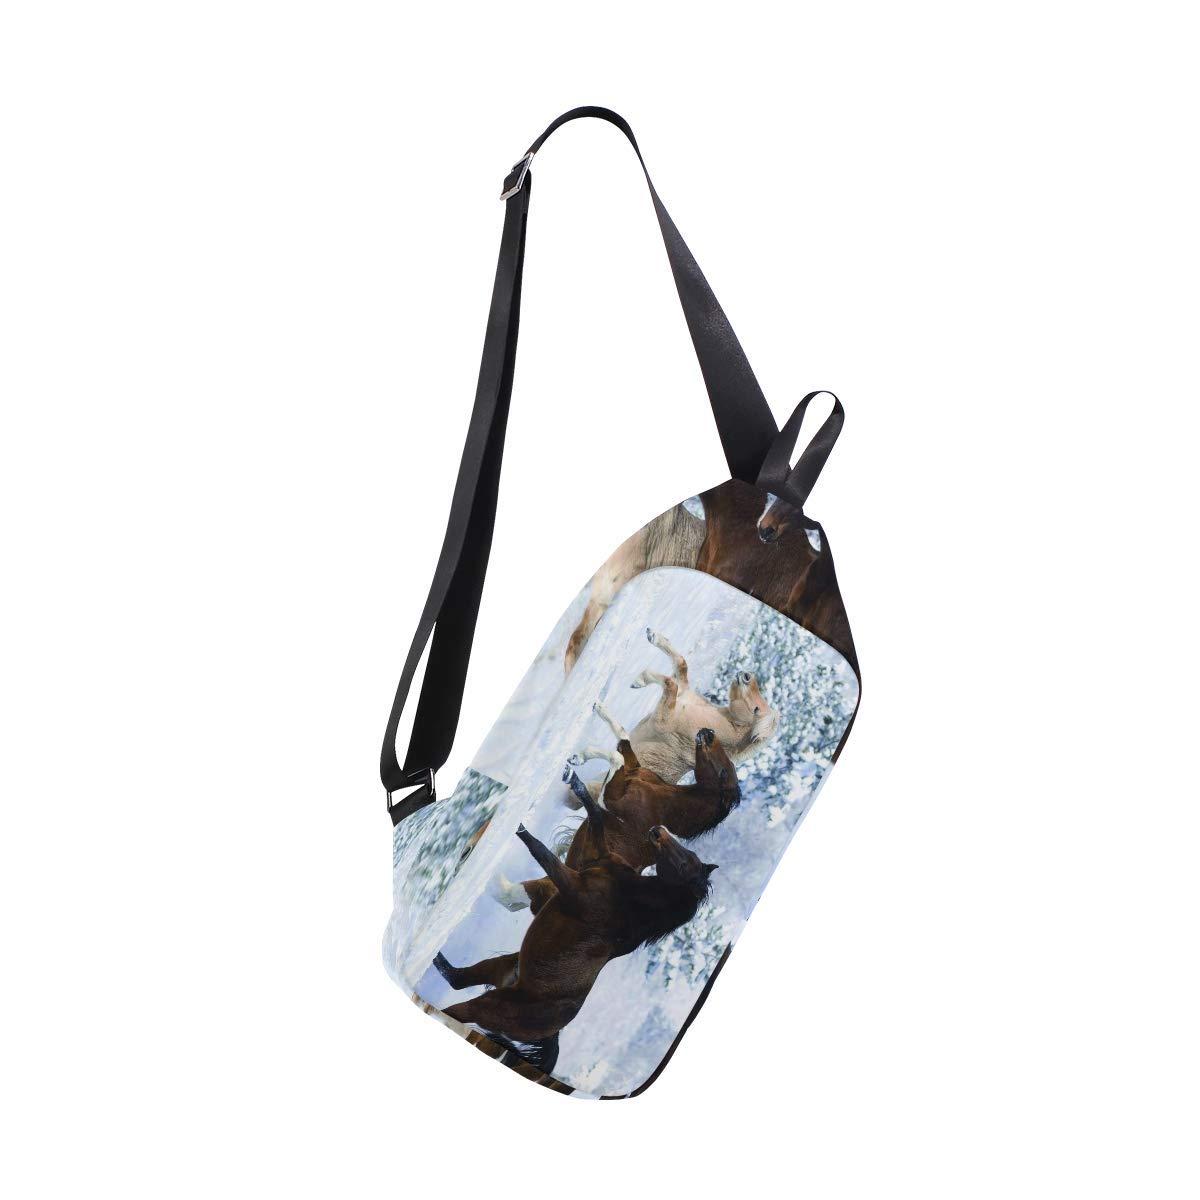 c486f32294 Get Quotations · Horse Pattern Print Chest Sling Bag Shoulder Backpack  Crossbody Daypack